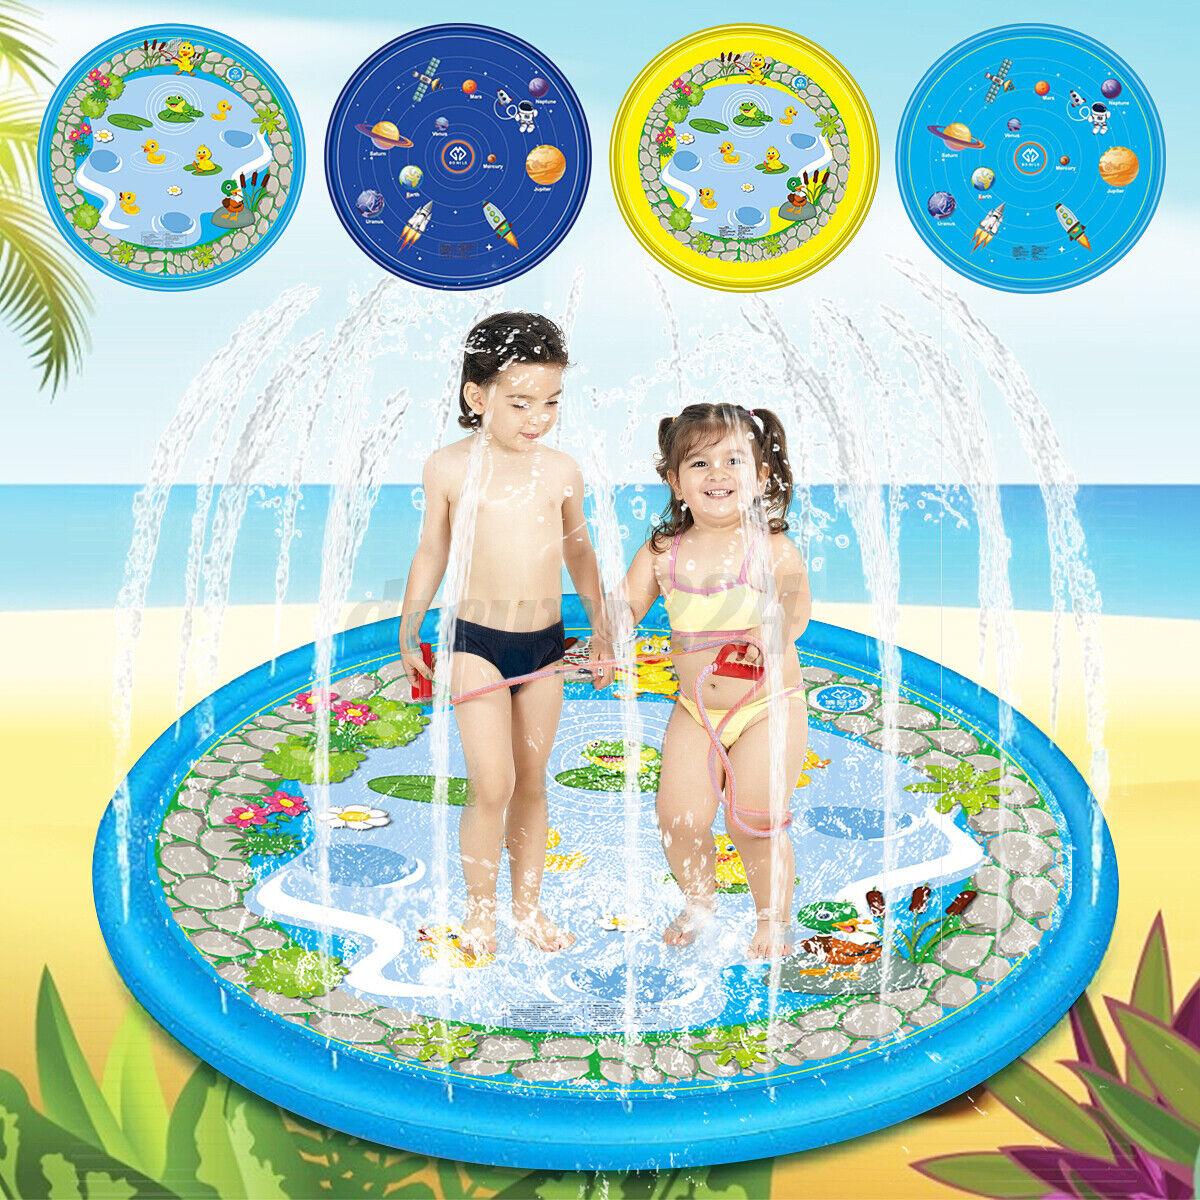 Kids Inflatable Fish Shape Water Splash Play Pool Playing Sprinkler Ma nb